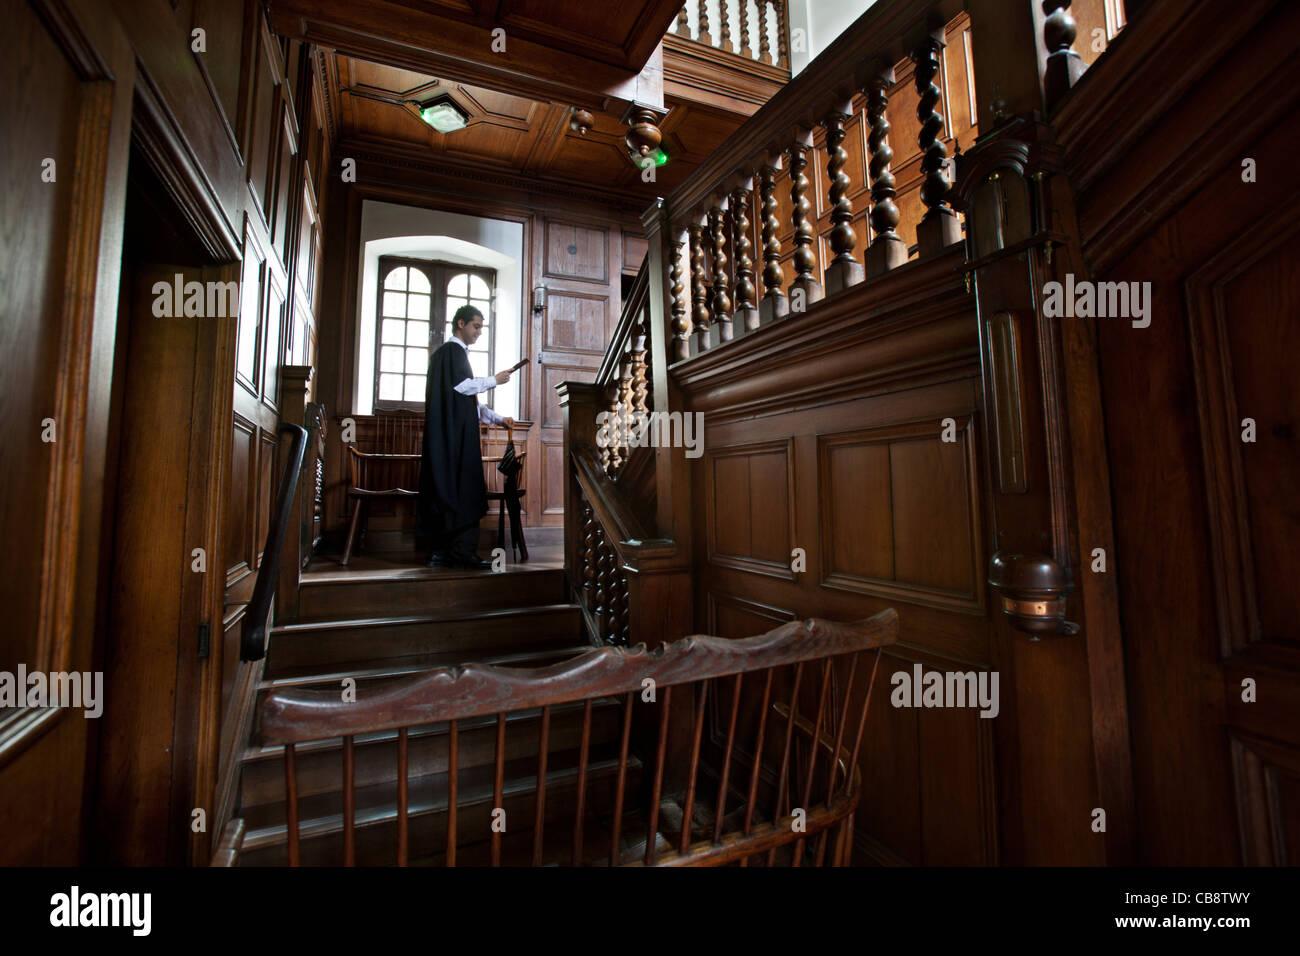 Jesus College education architecture Oxford - Stock Image